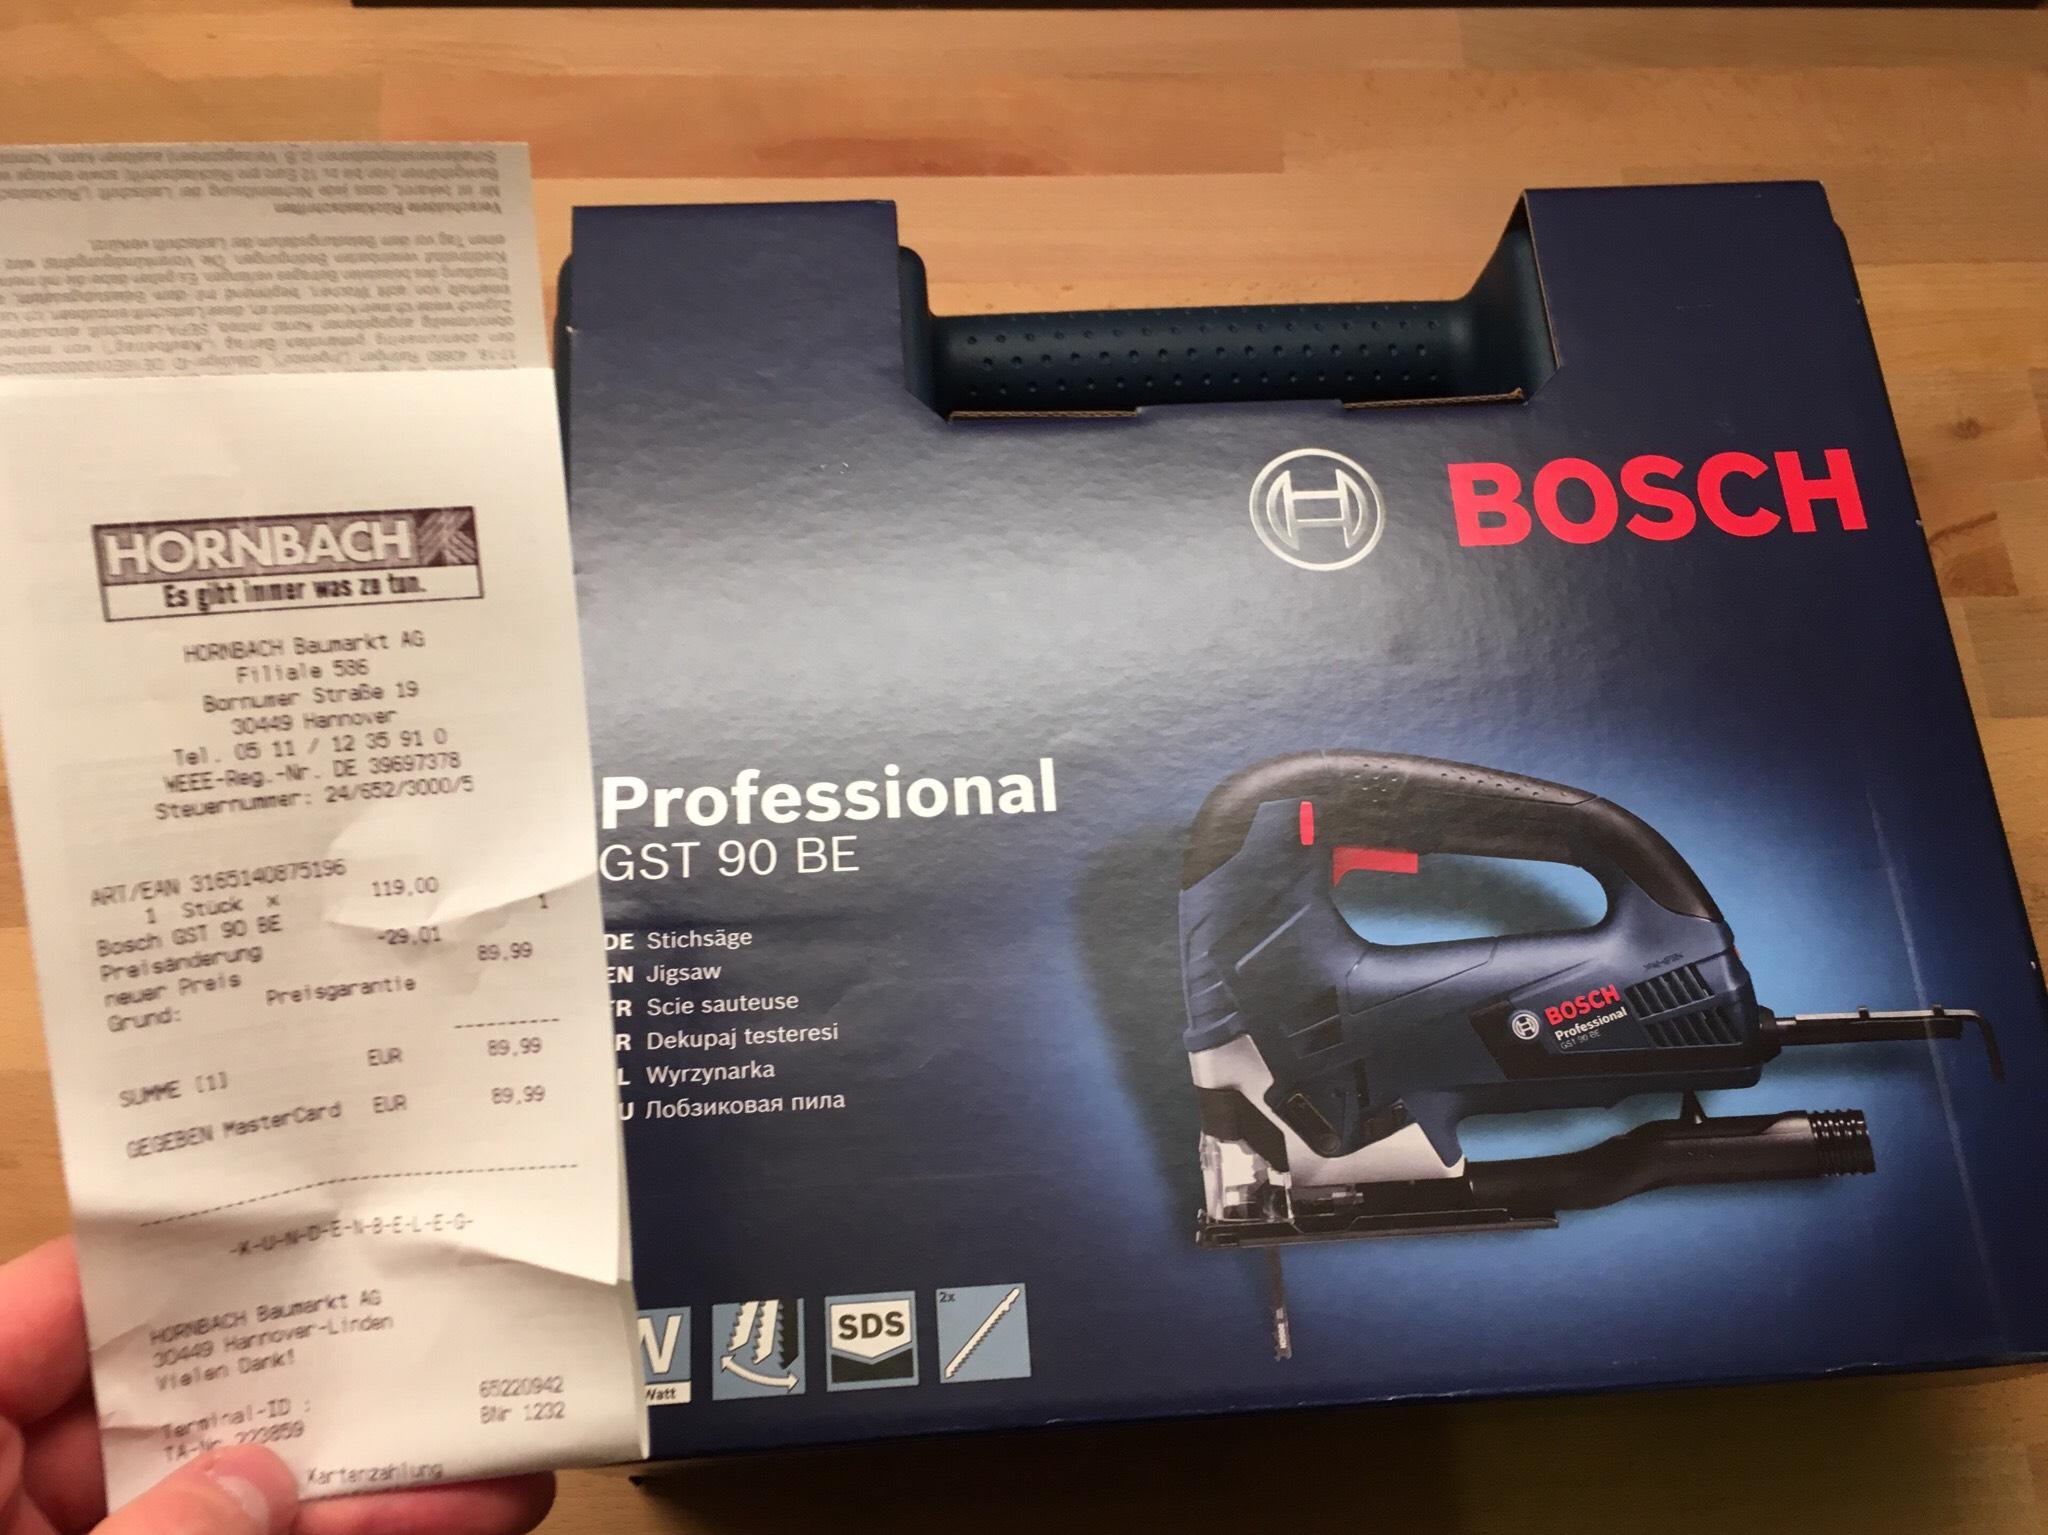 Bosch GST 90 BE [Hornbach Tiefpreisgarantie]